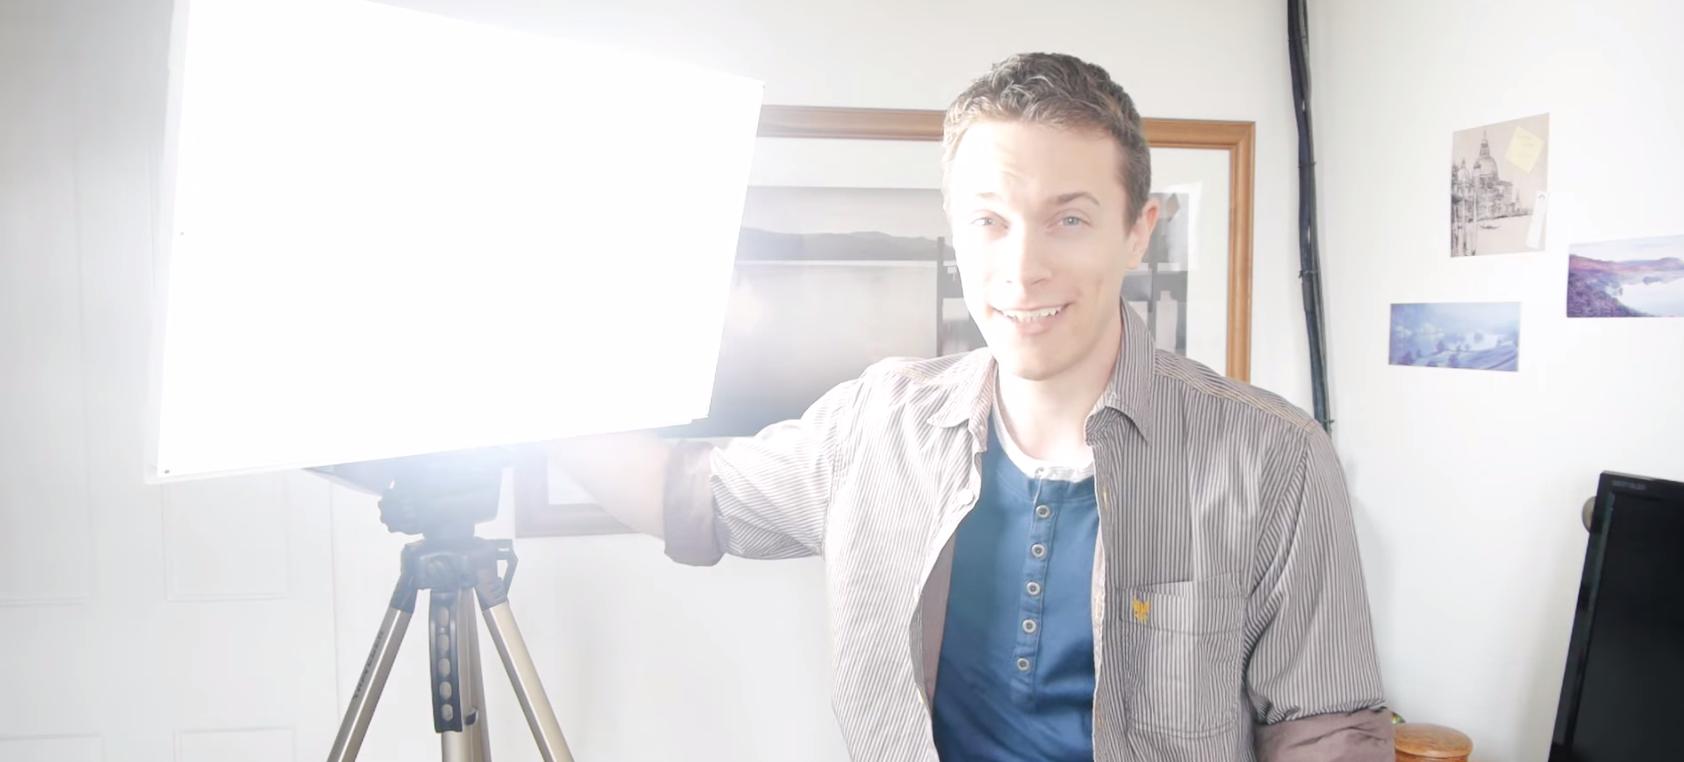 How To Create A 1000 Watt Equivalent Led Light Panel The